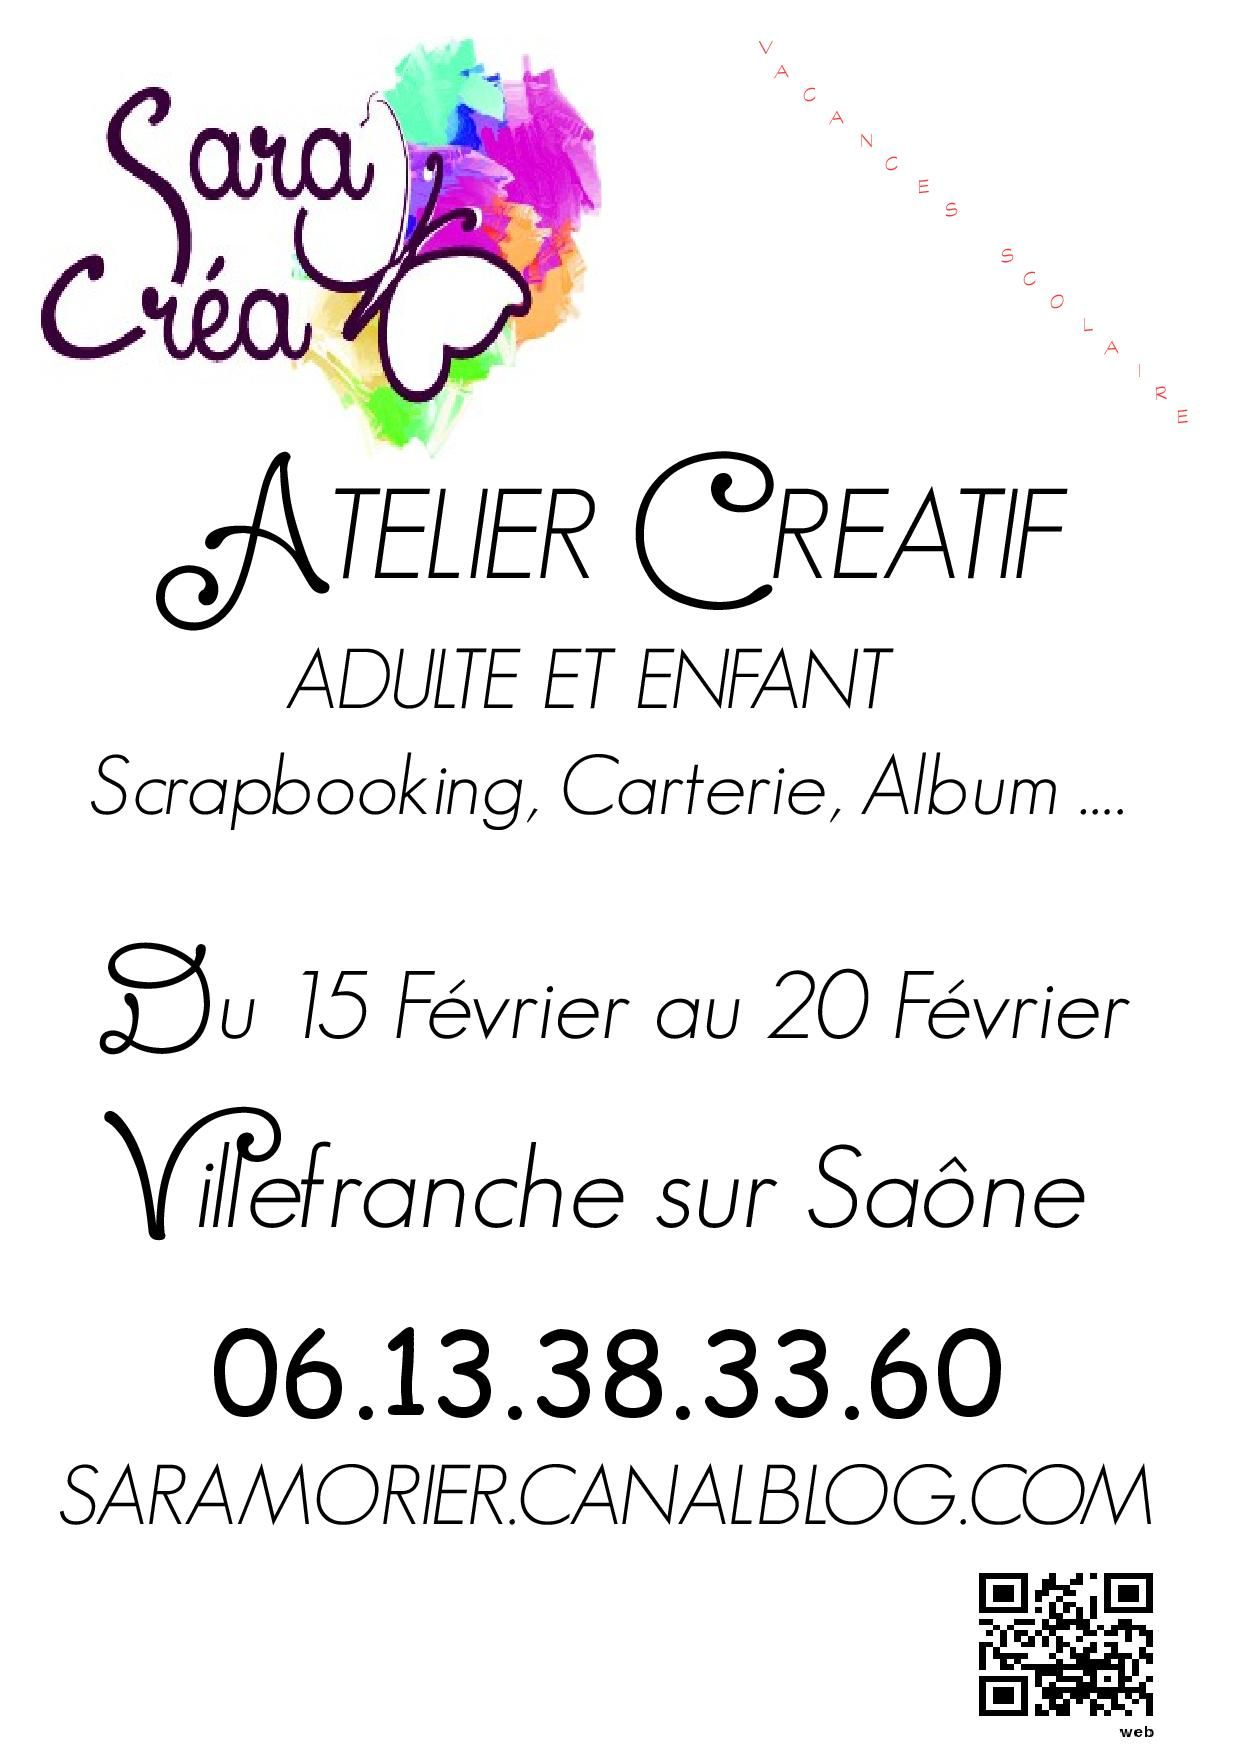 100 Incroyable Suggestions Atelier Creatif Villefranche Sur Saone